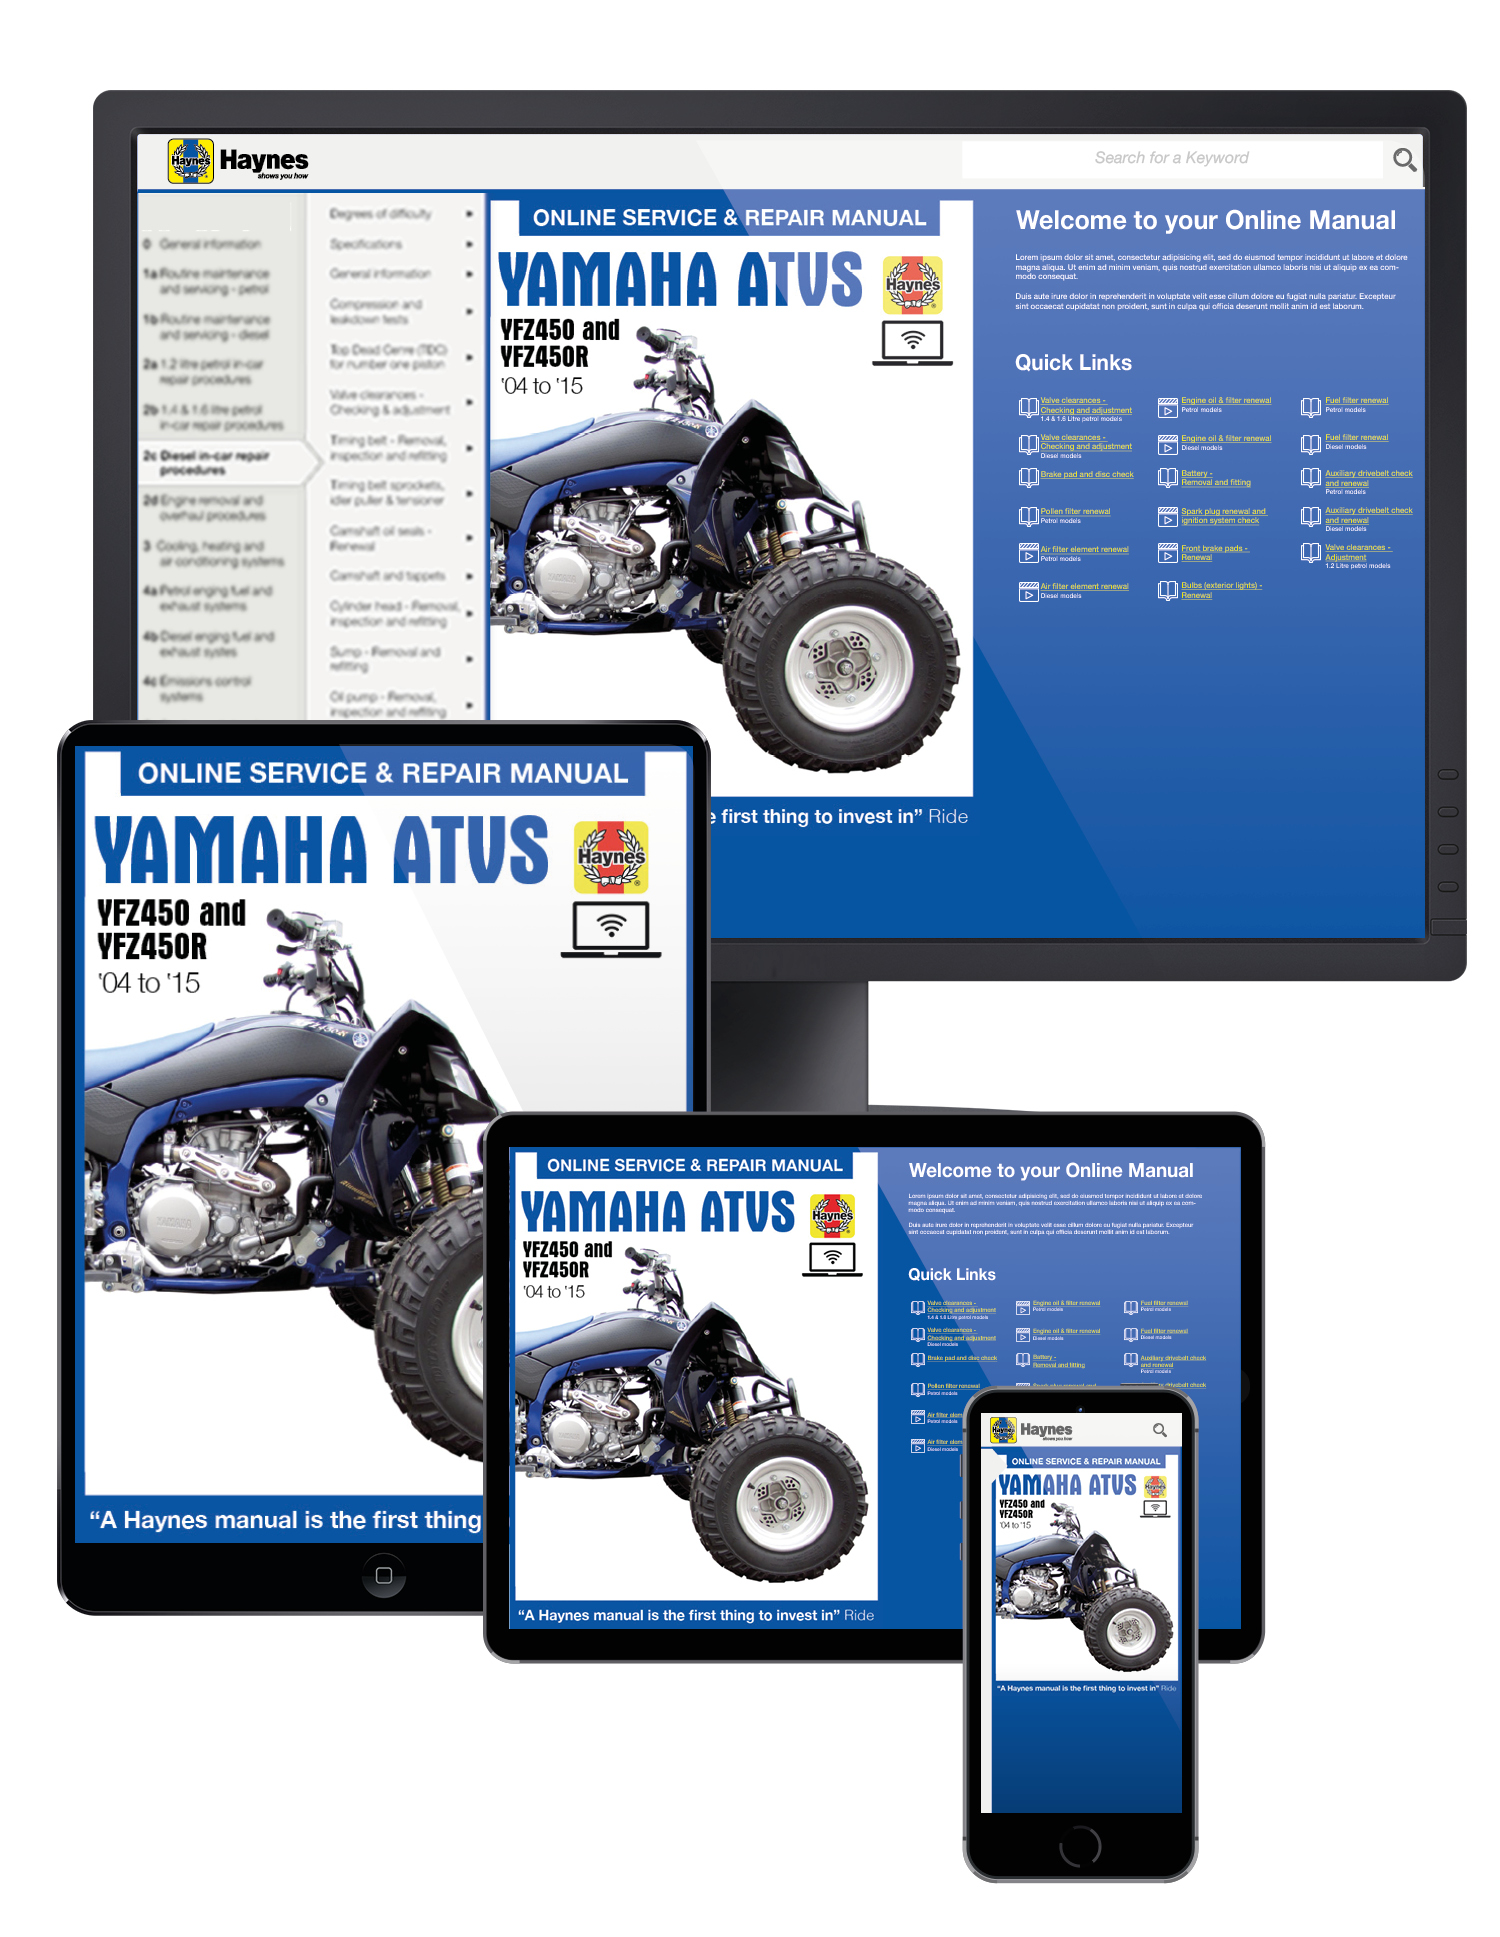 Yfz450 Haynes Publishing Yfz 450r Wiring Diagram Online Manual Enlarge Yamaha Yfz450r